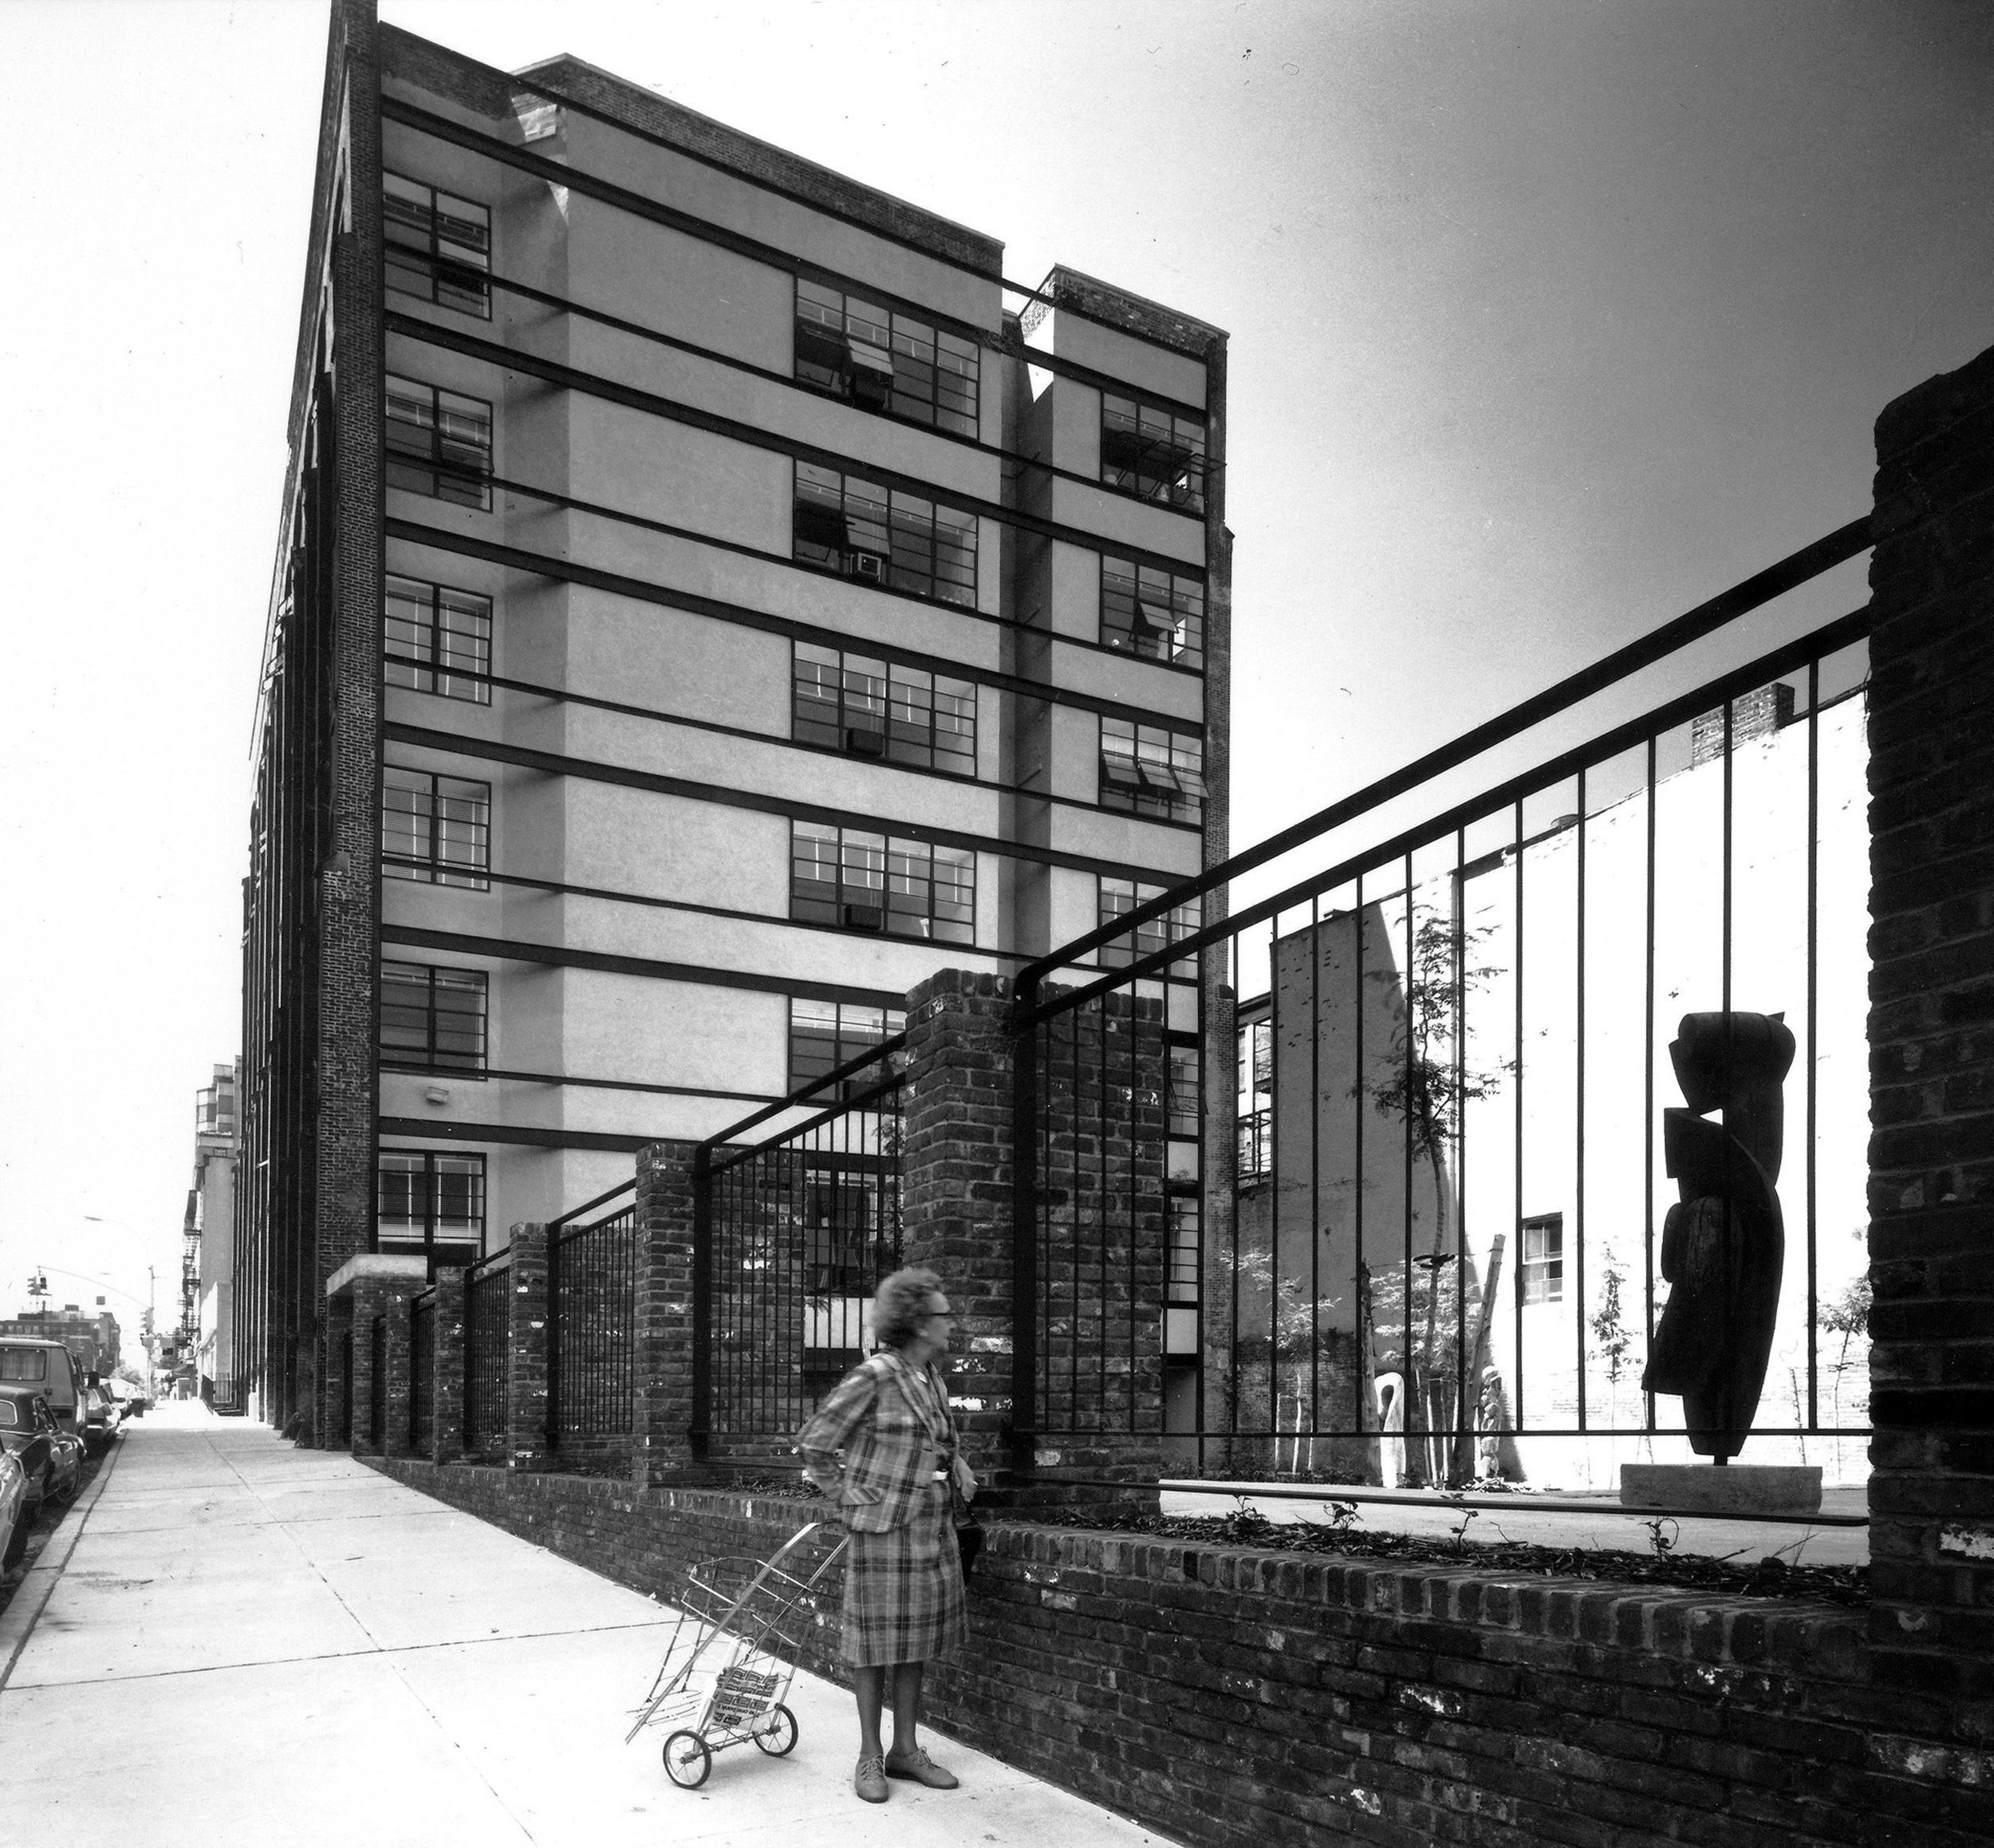 Henry Street Studios